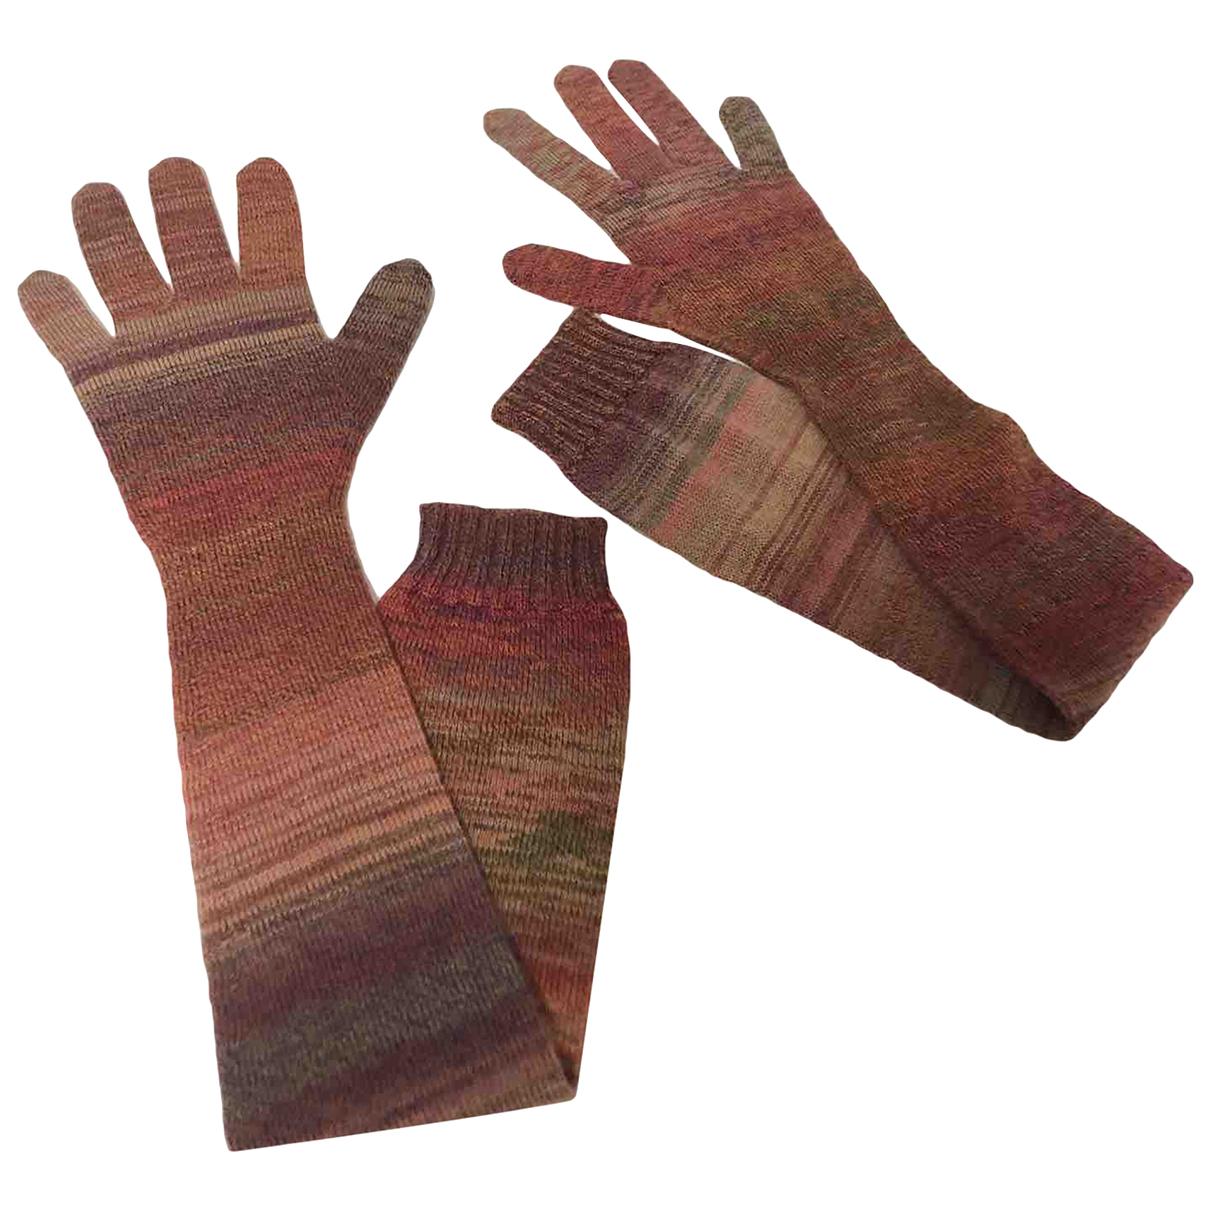 Yves Saint Laurent \N Handschuhe in  Rot Wolle